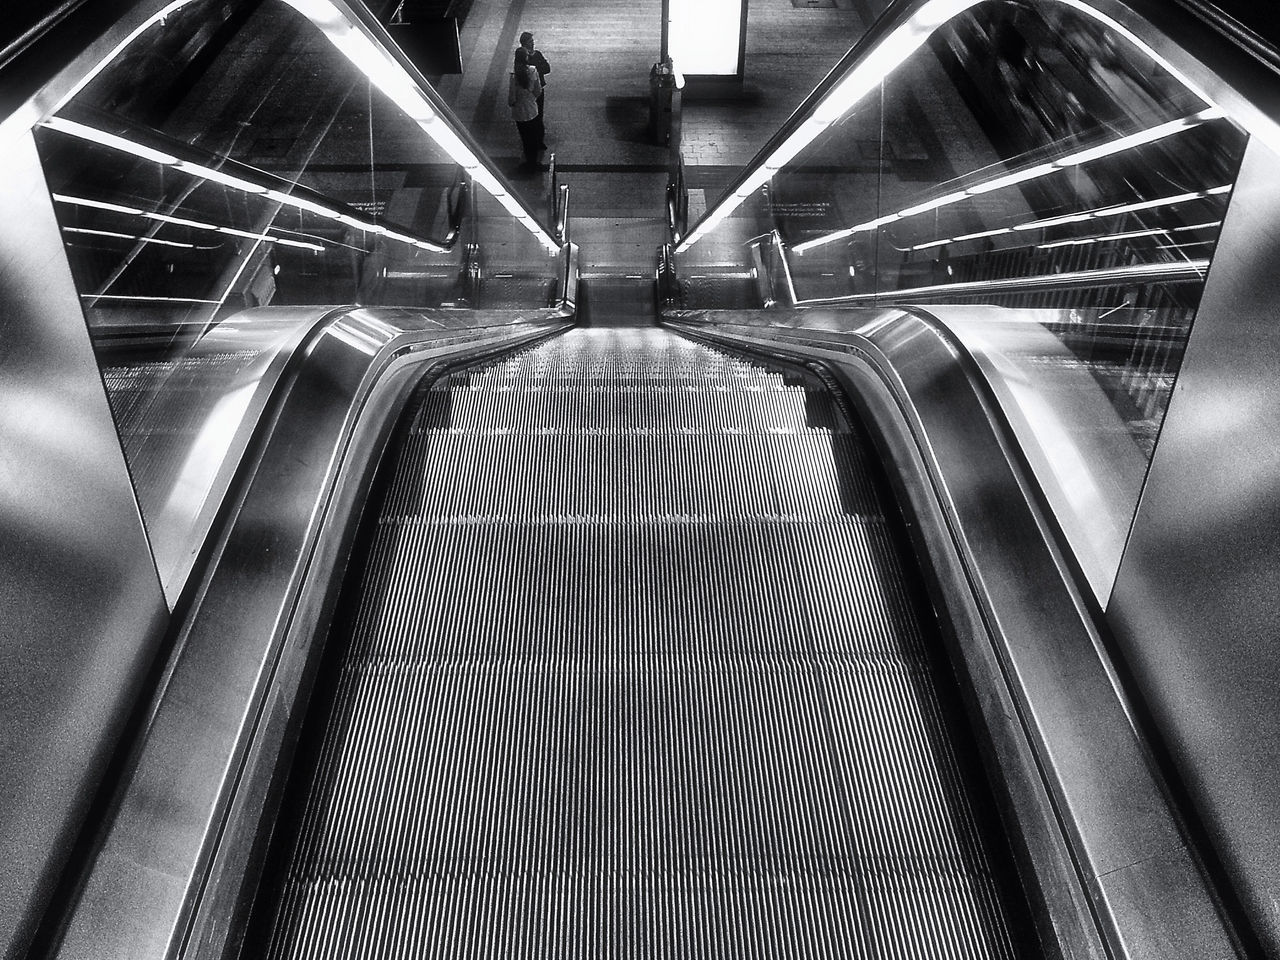 Close-up high angle view of escalator